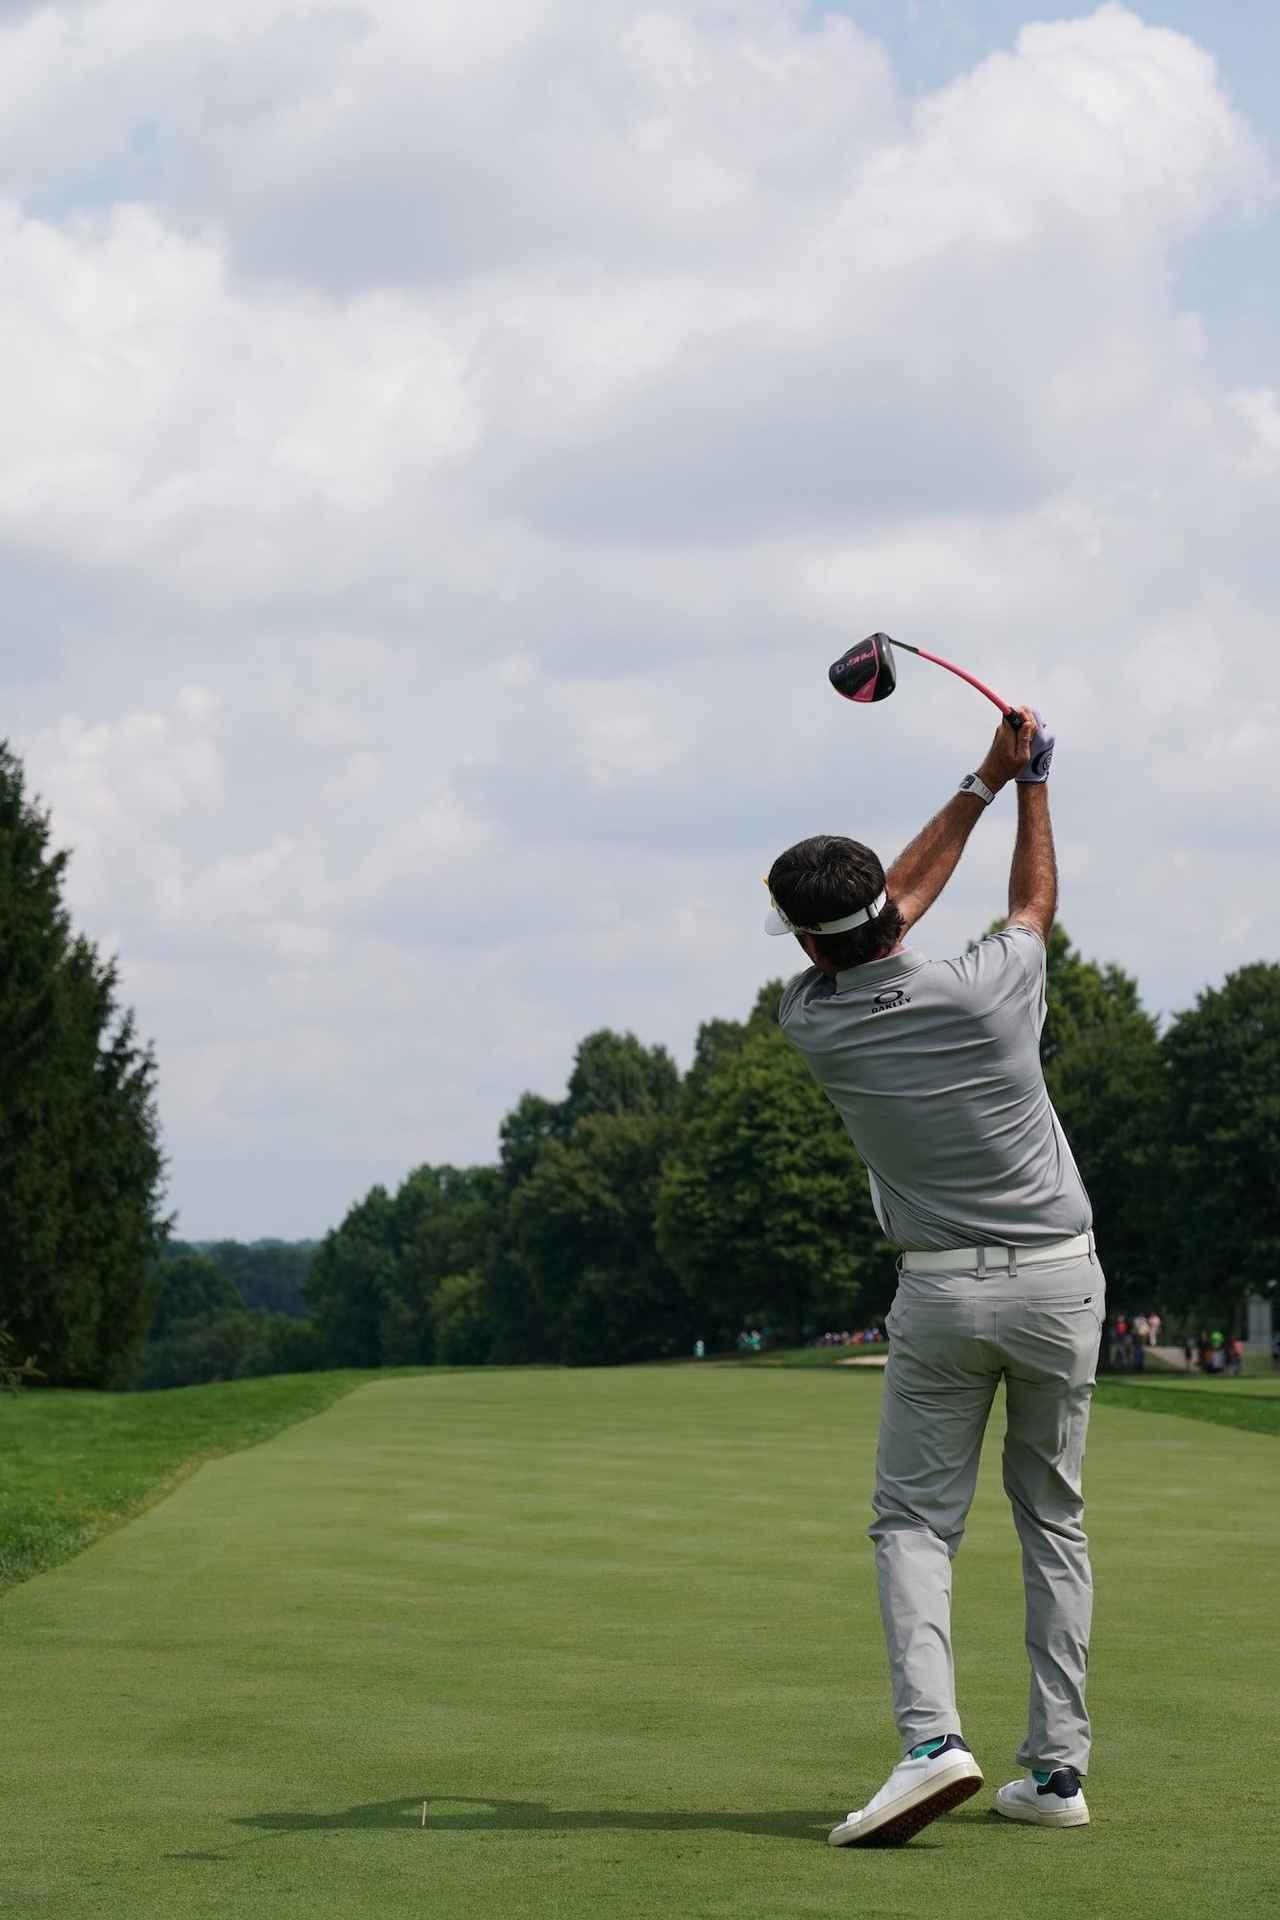 Images : 20番目の画像 - 強烈! バッバ・ワトソンのドライバーショット - みんなのゴルフダイジェスト